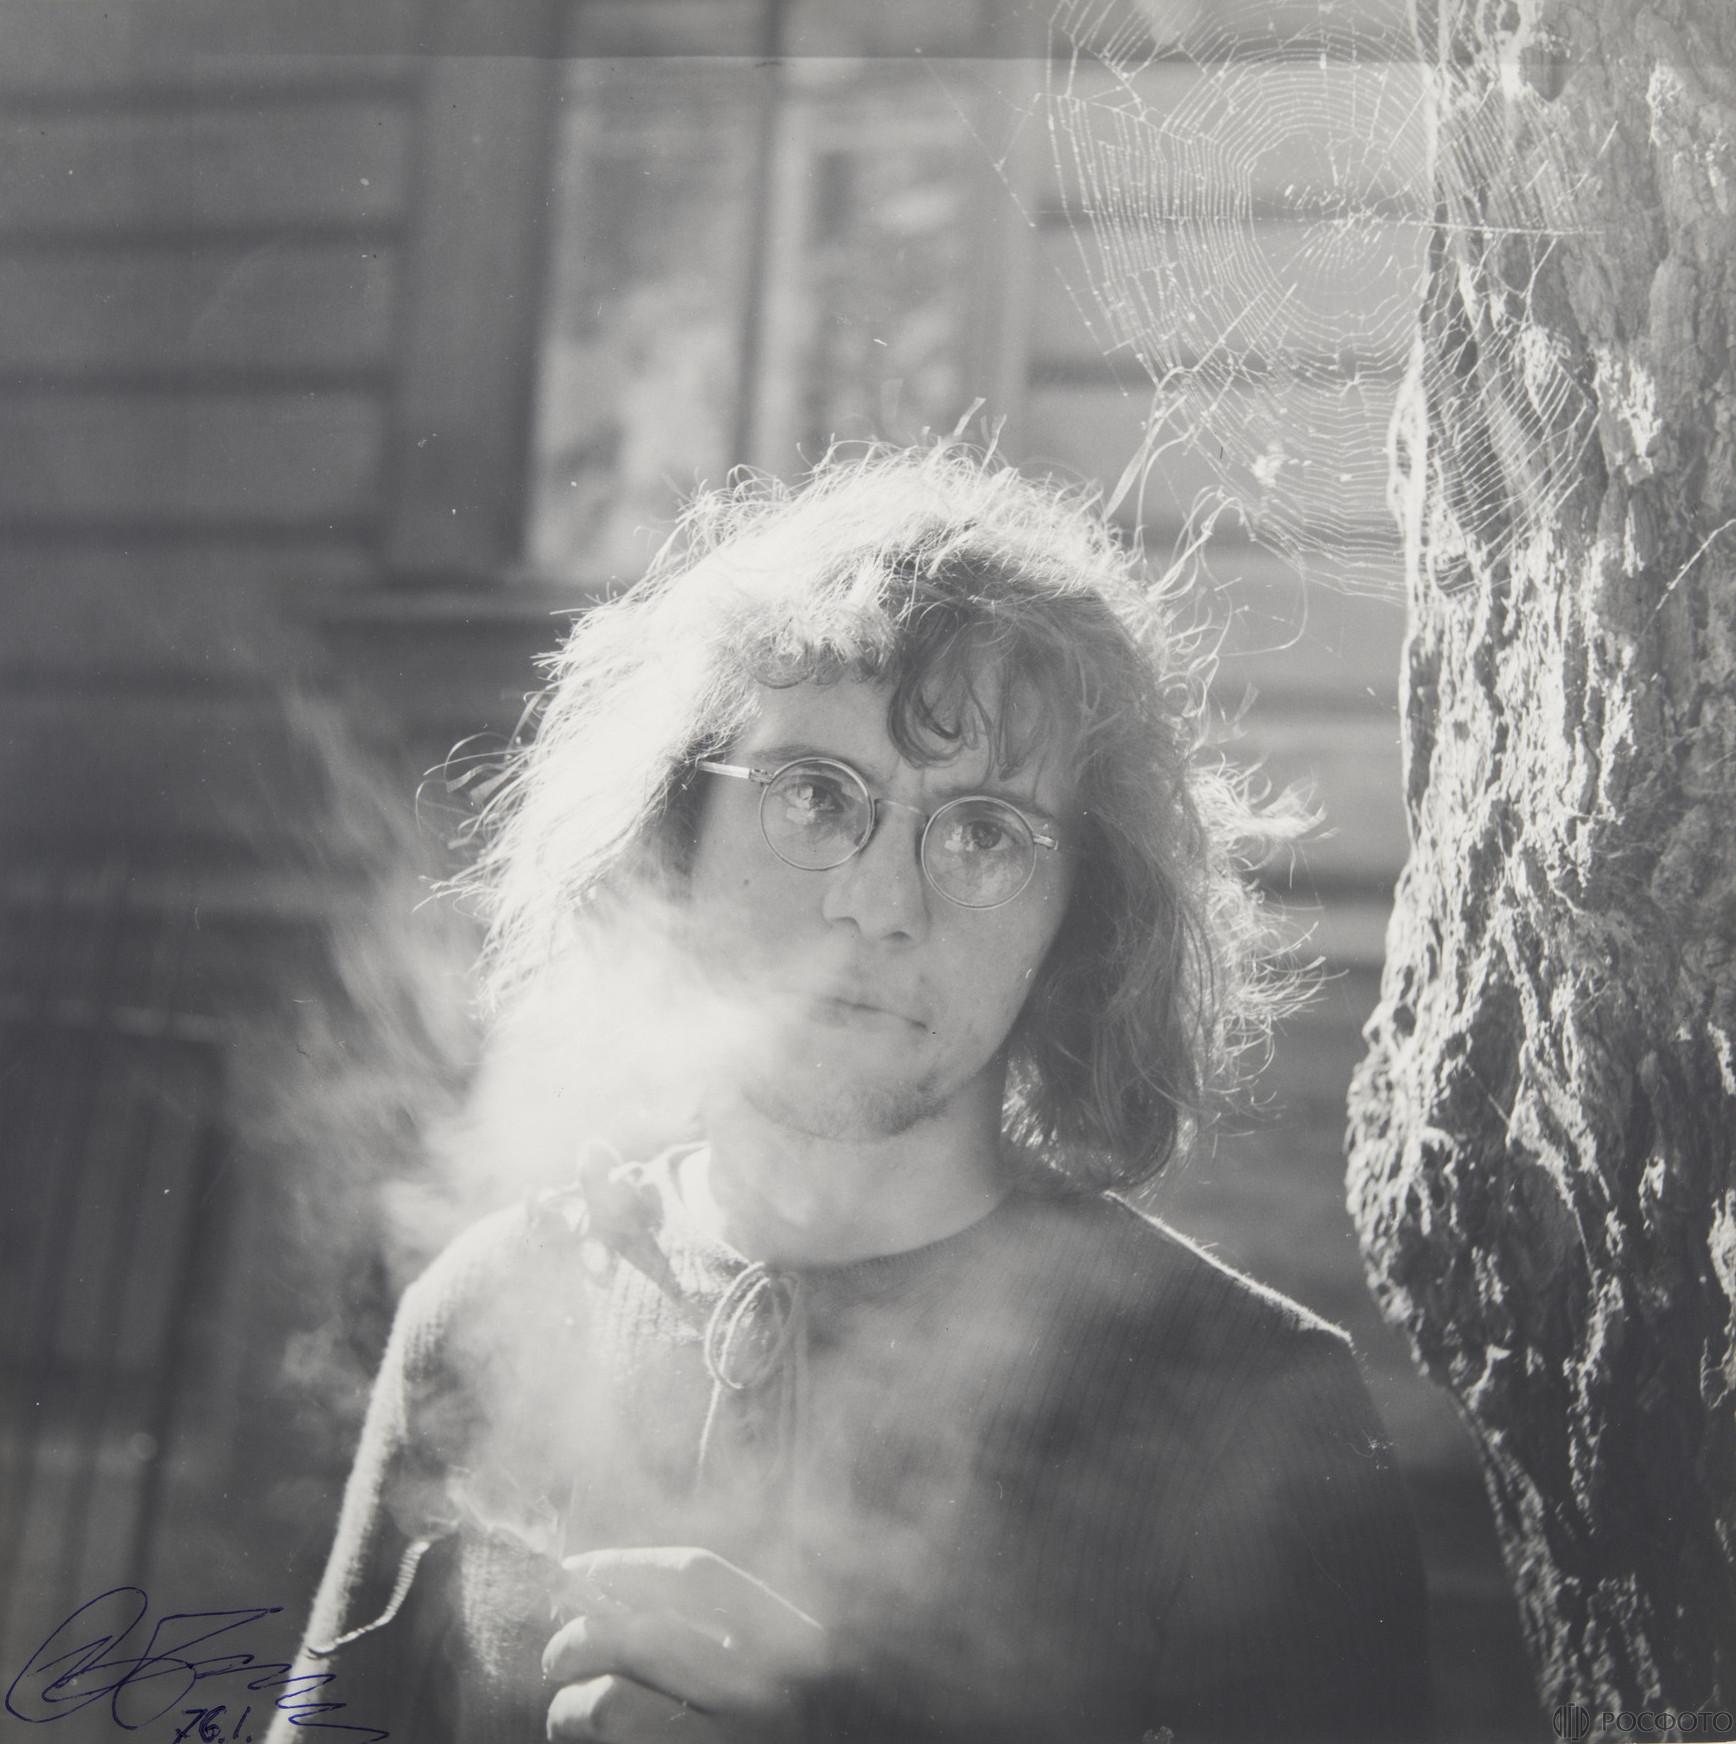 1970-е. Портрет Бориса Смелова